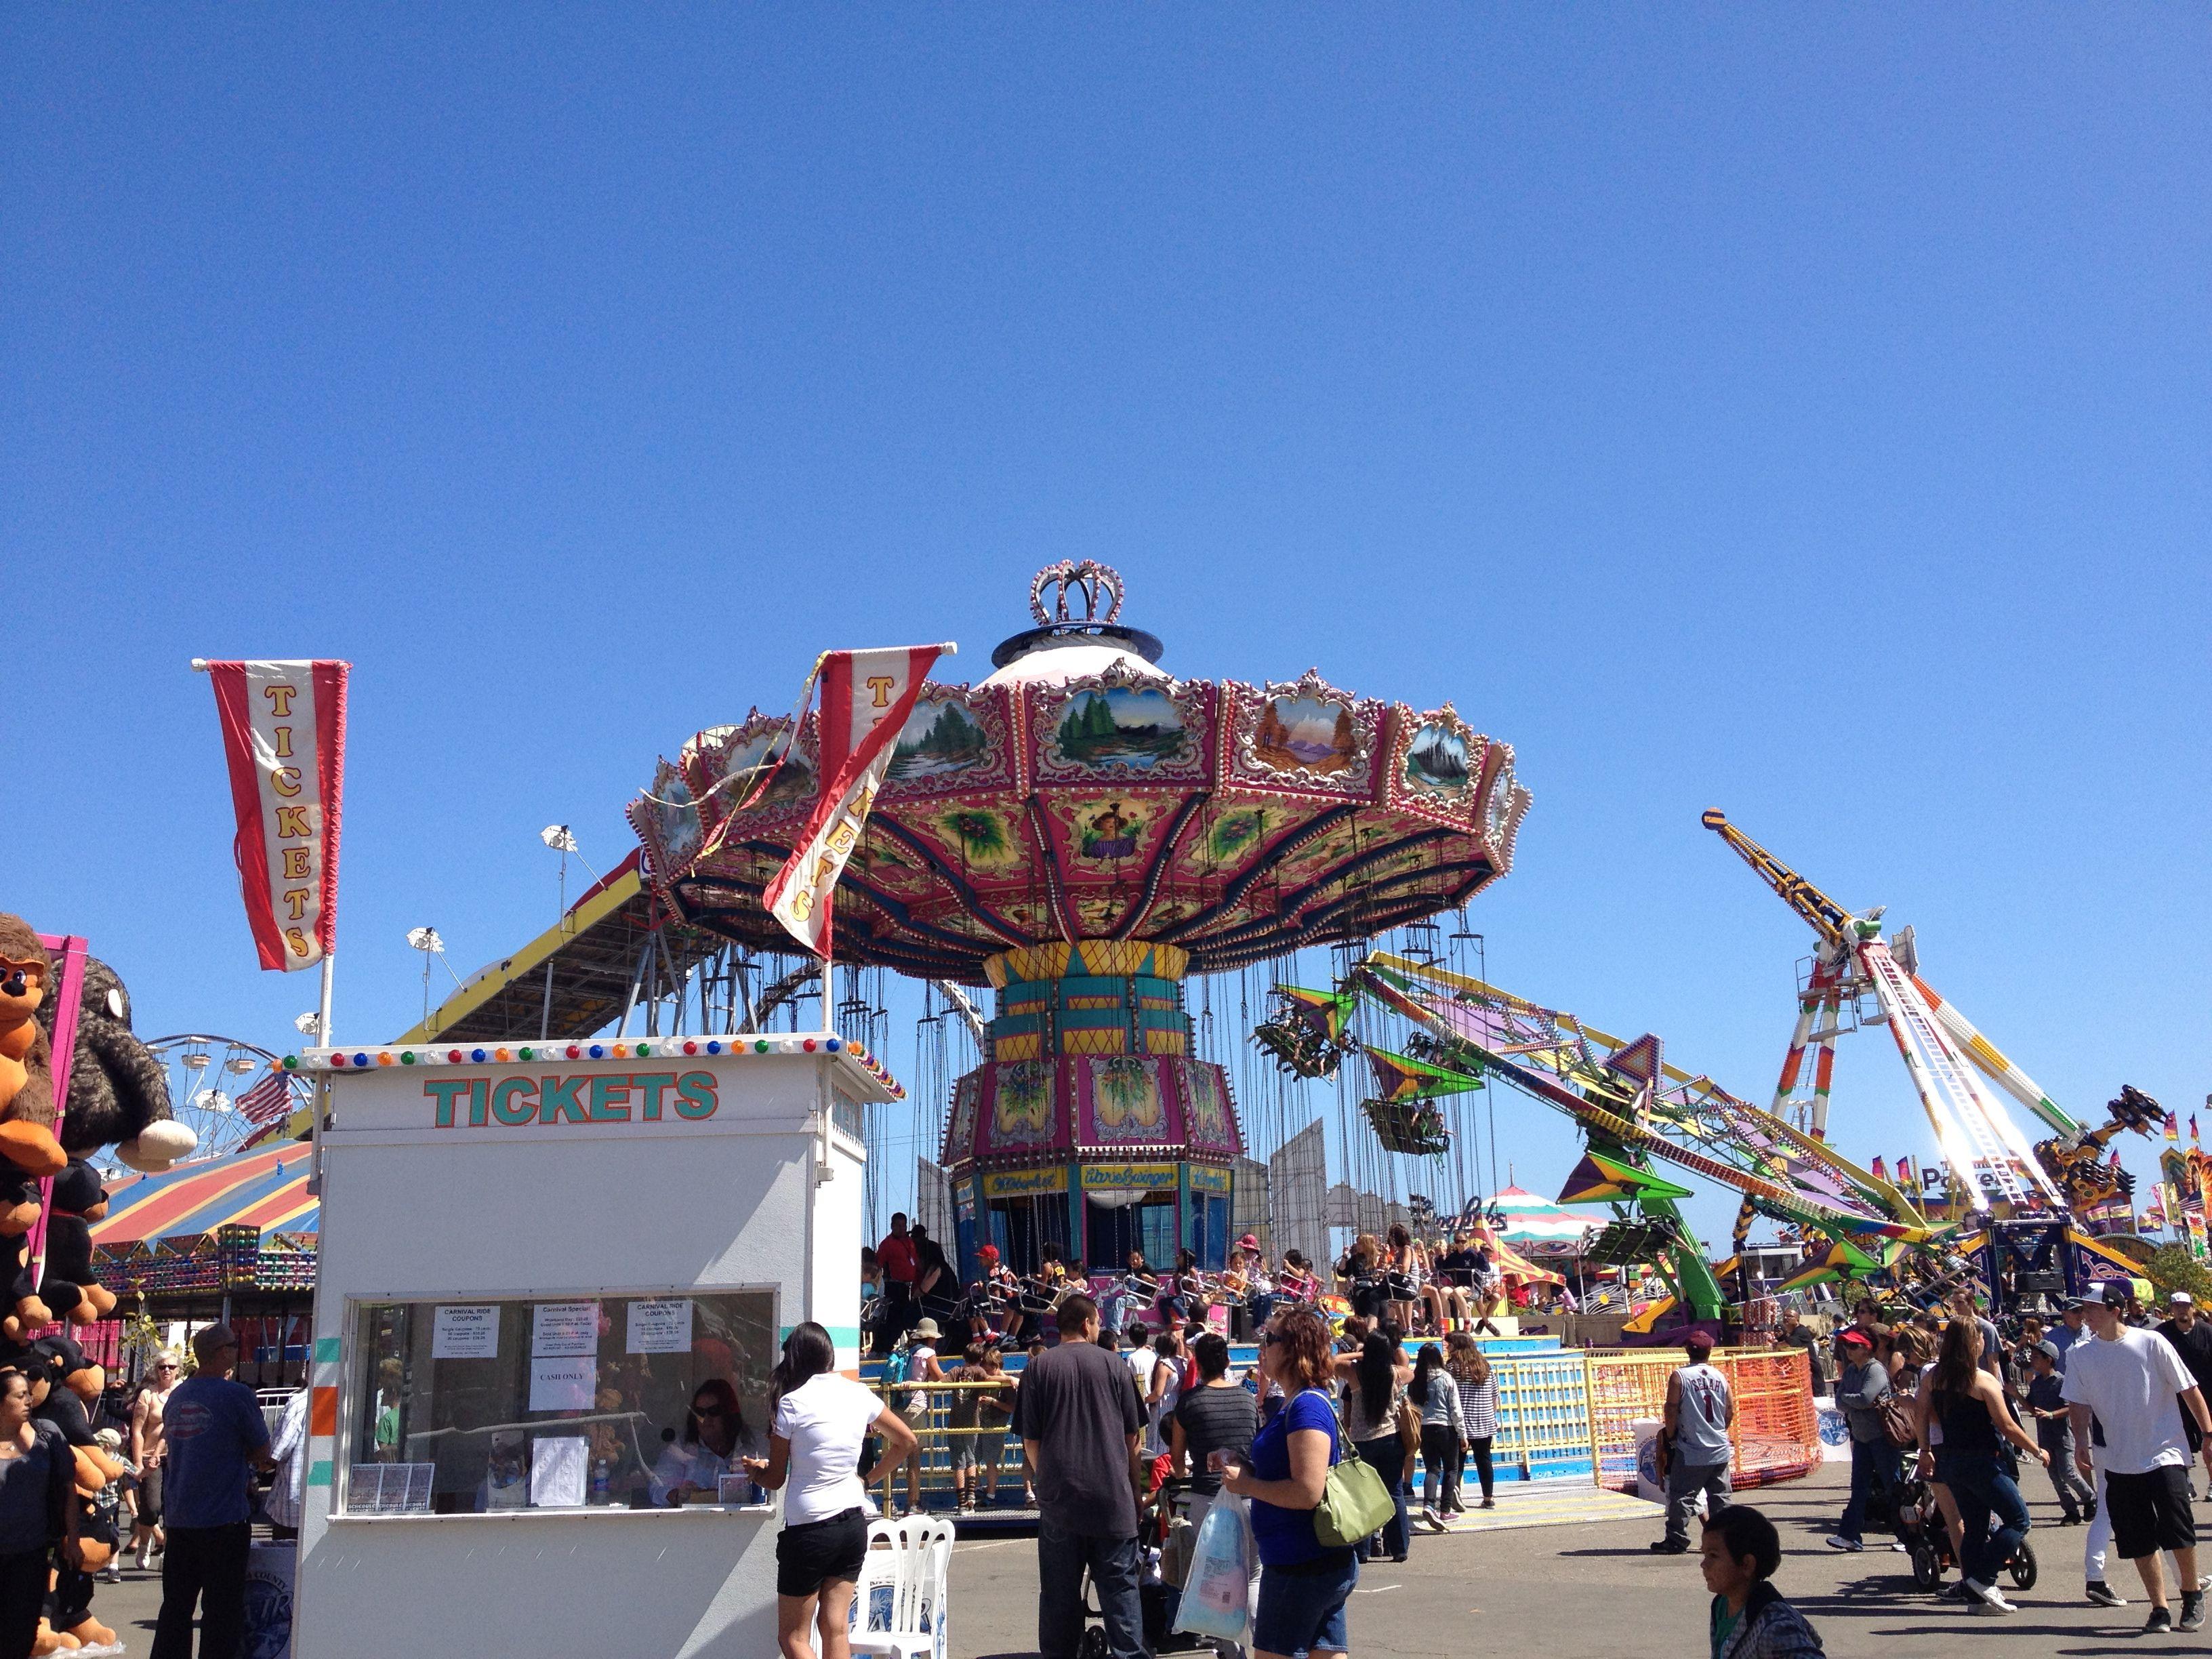 ventura, ca - ventura county fair | ventura home sweet home